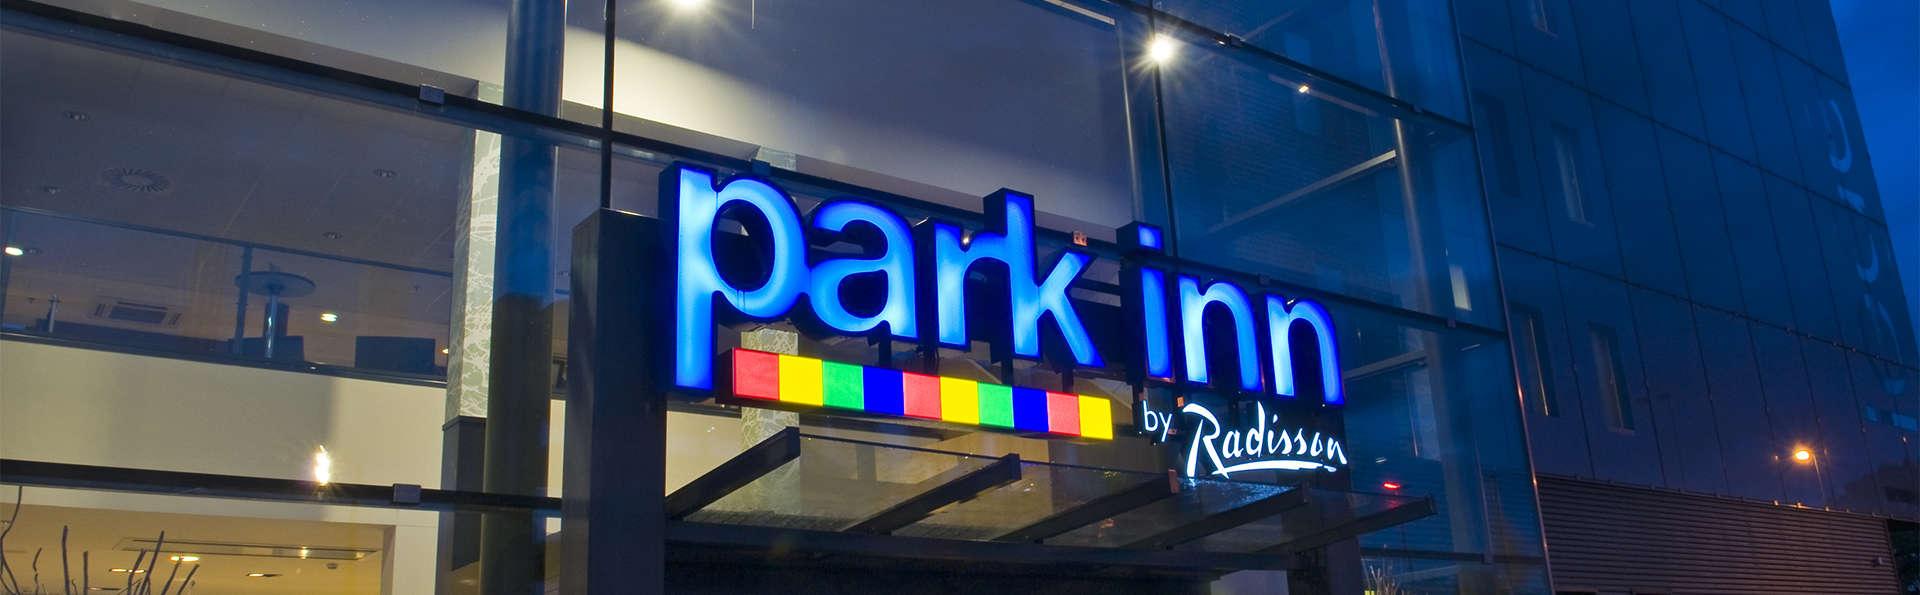 Park Inn by Radisson Liège Airport - EDIT_front.jpg